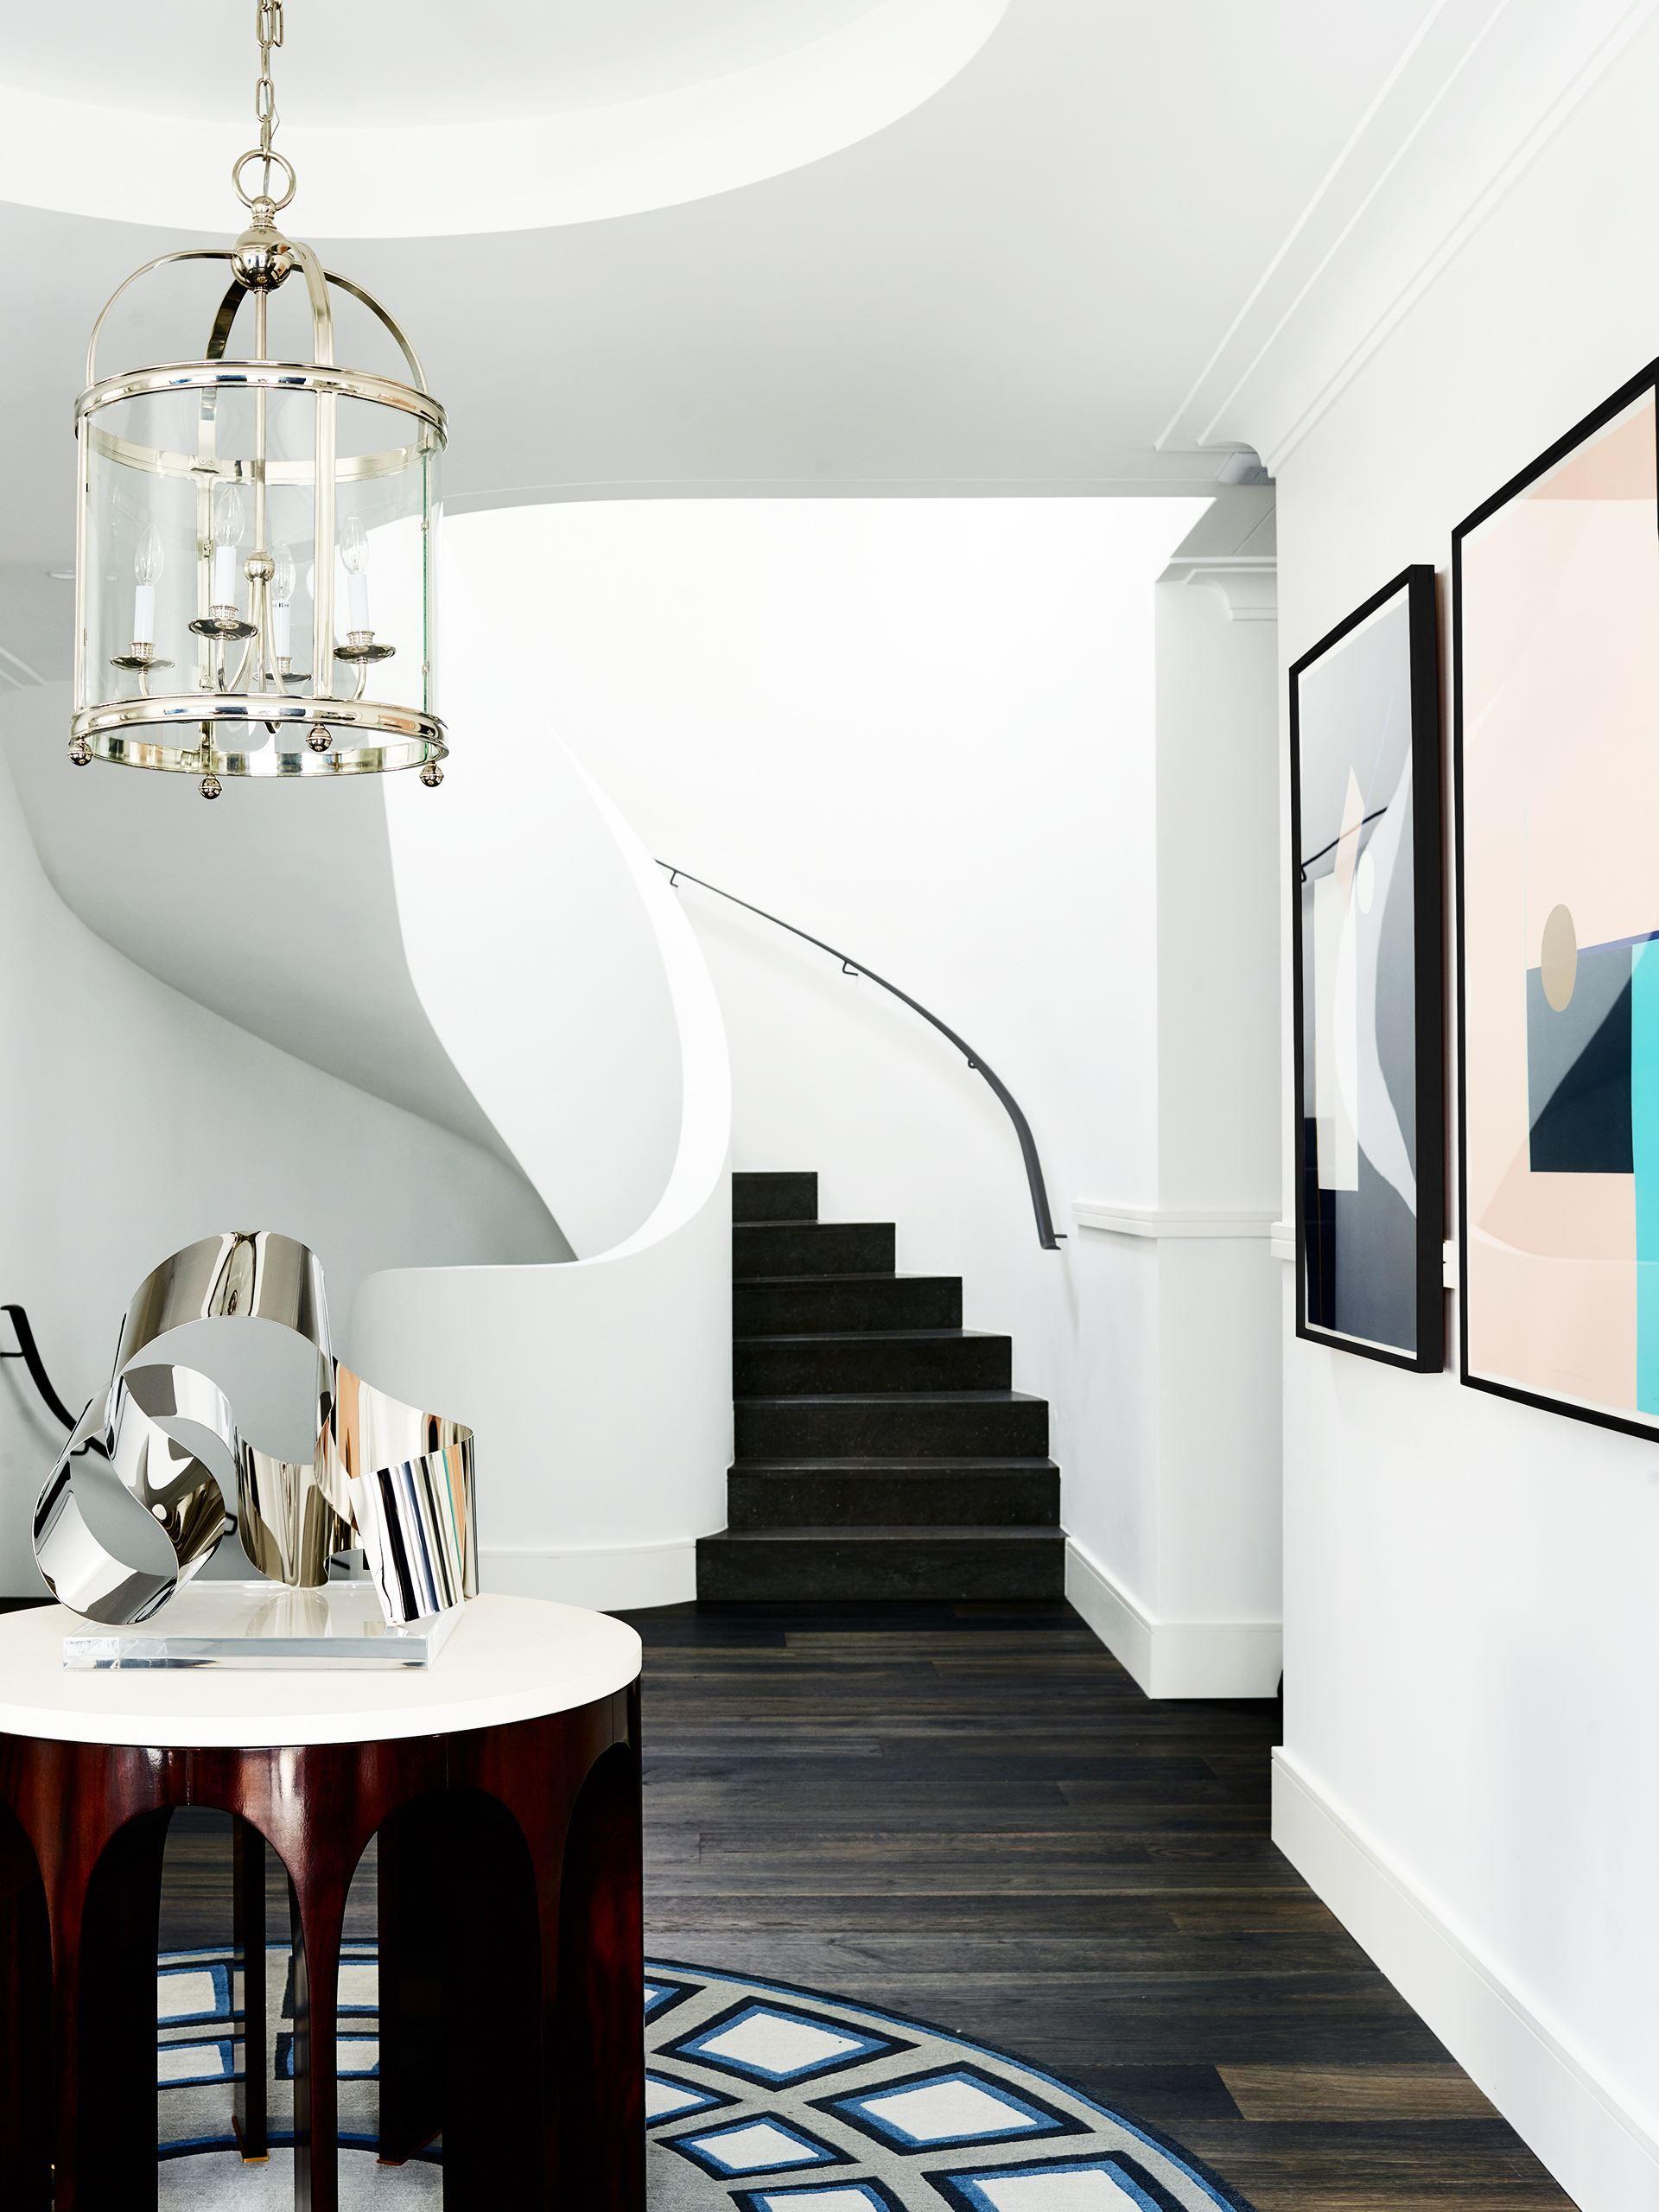 Sydney Art Deco Home By Interior Designer Greg Natale   Natale, Art ...